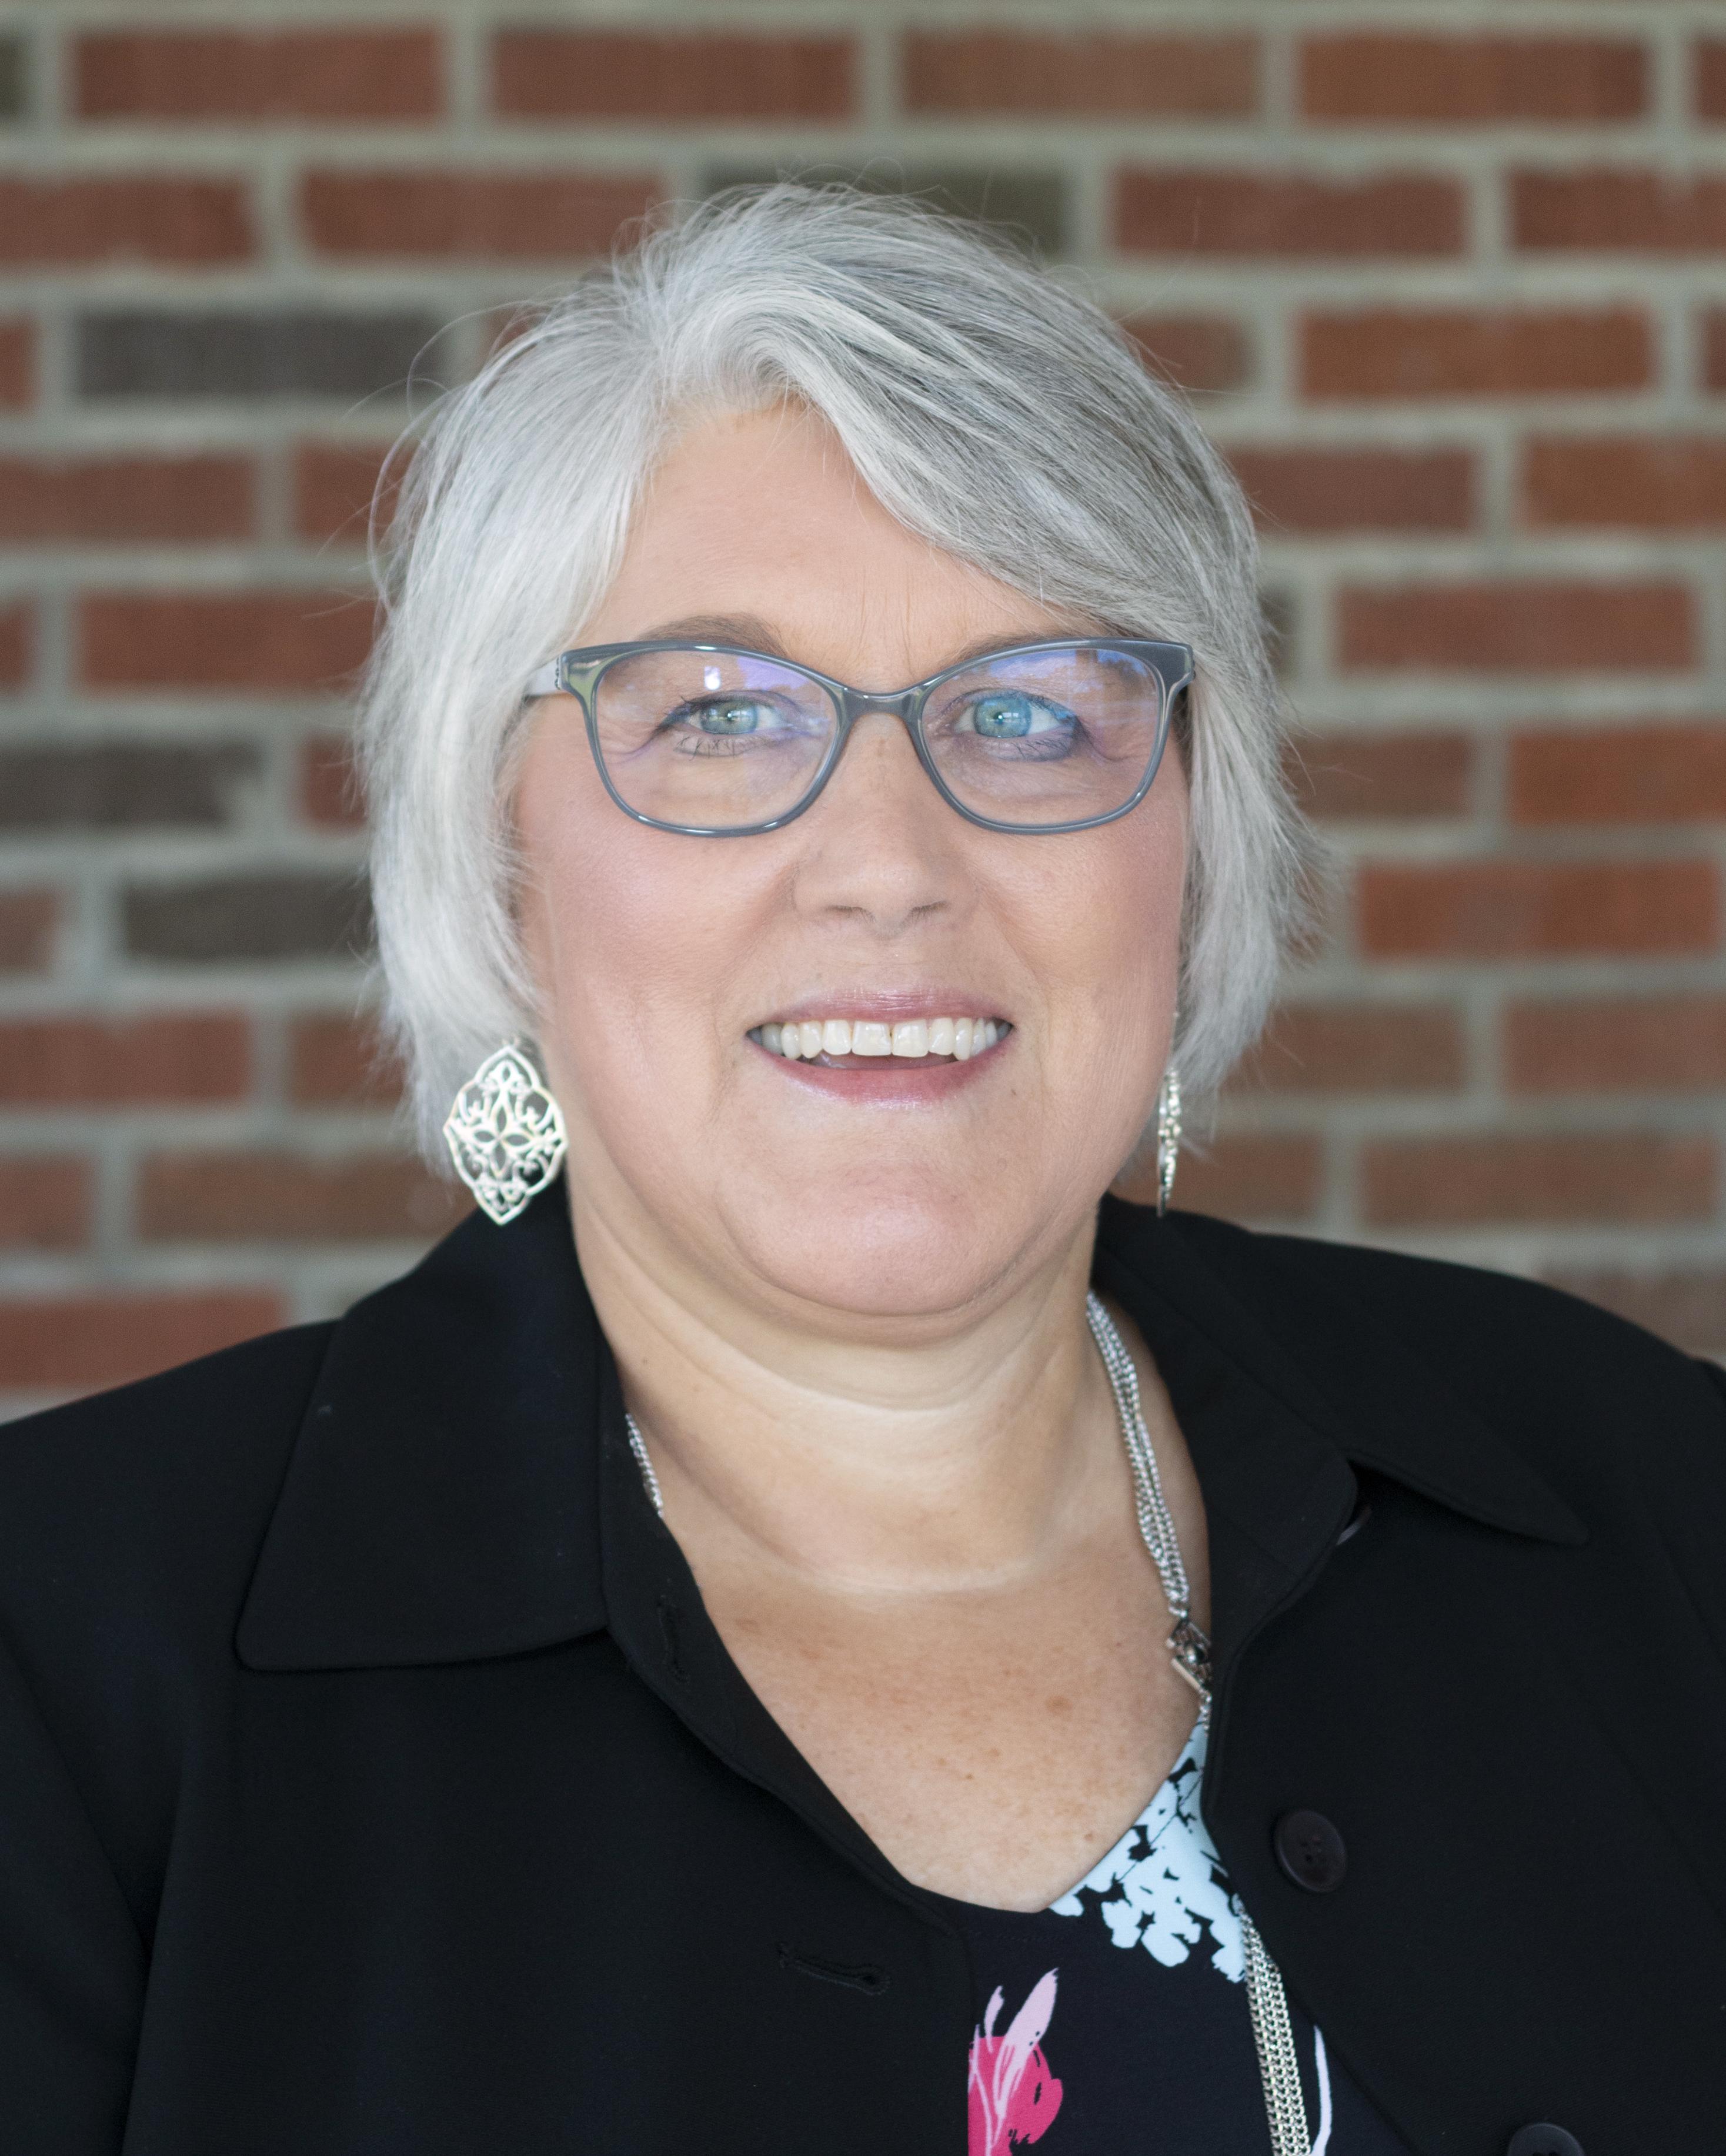 City Clerk/Treasurer Carol Westergren